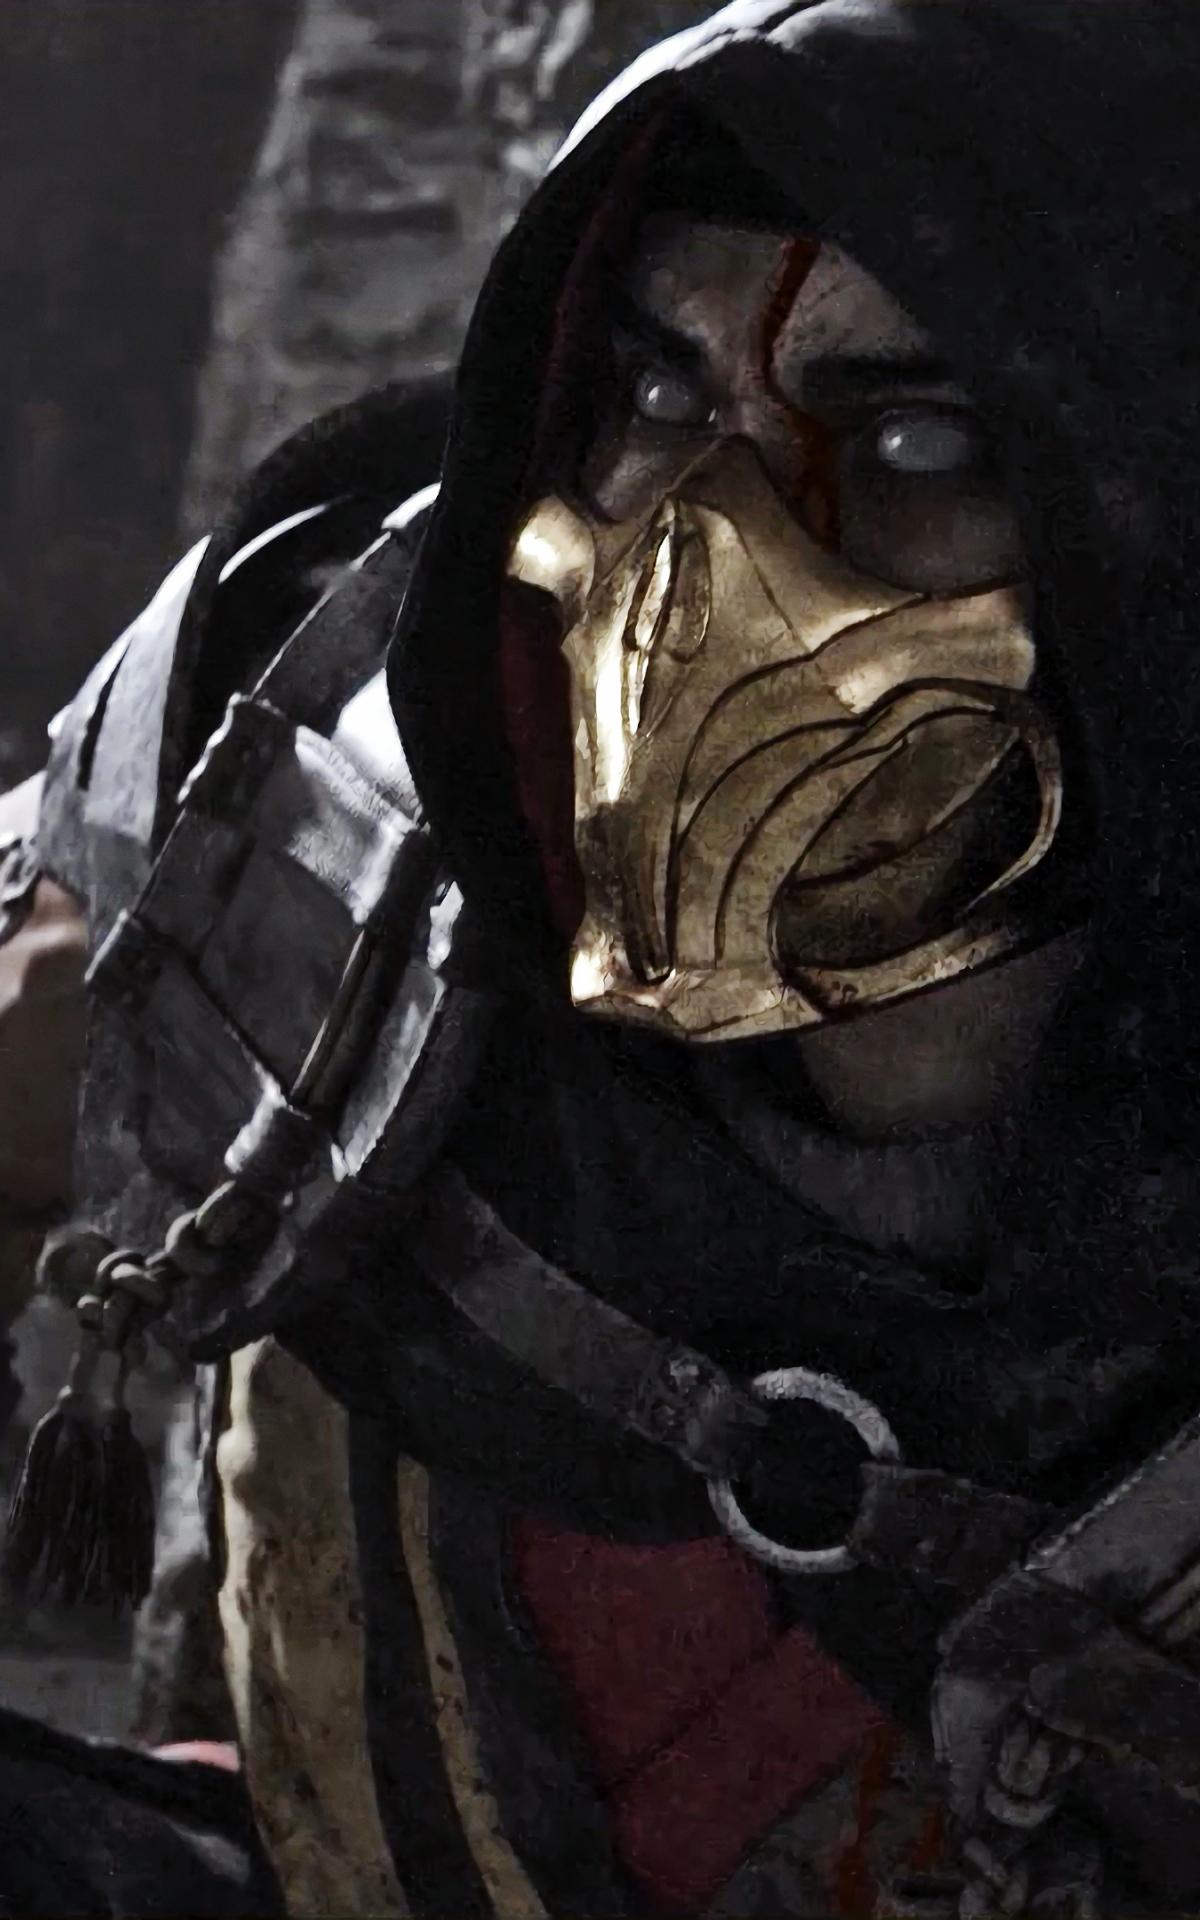 Free Download Mortal Kombat 11 4k 8k Hd Wallpaper 3840x2160